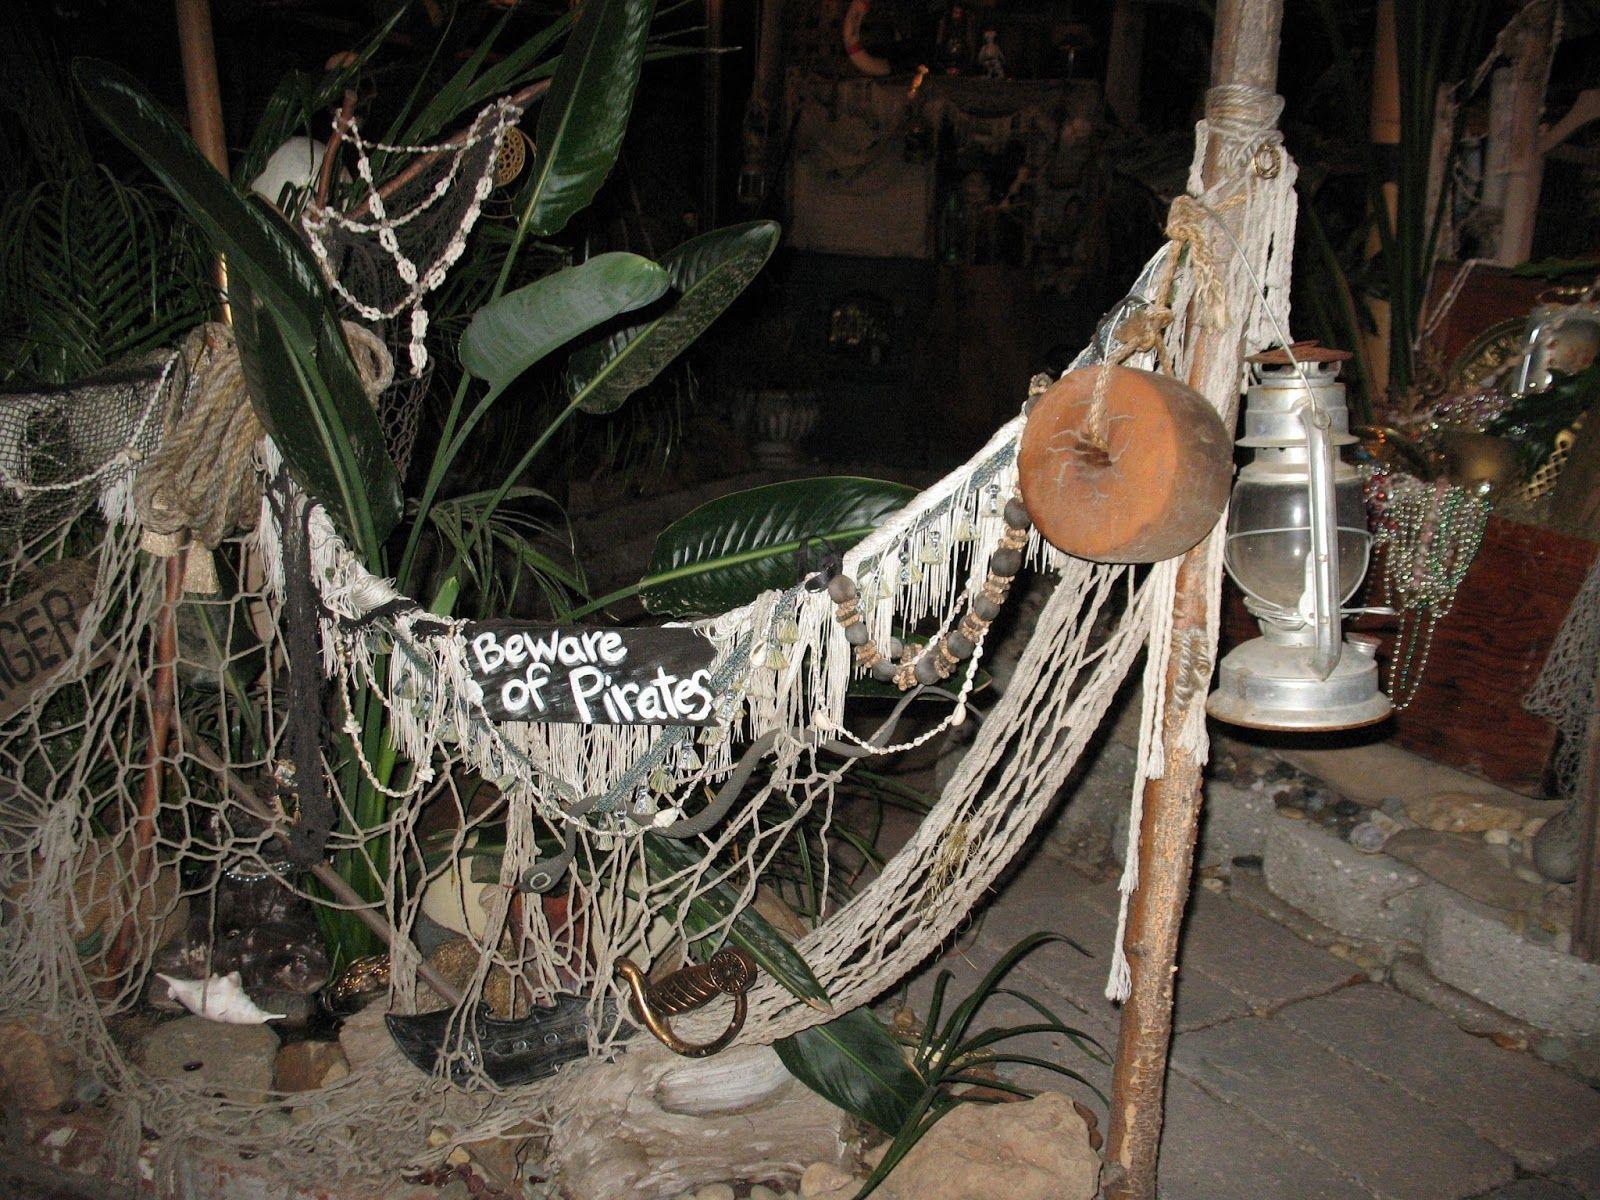 pirate halloween decorations outdoor